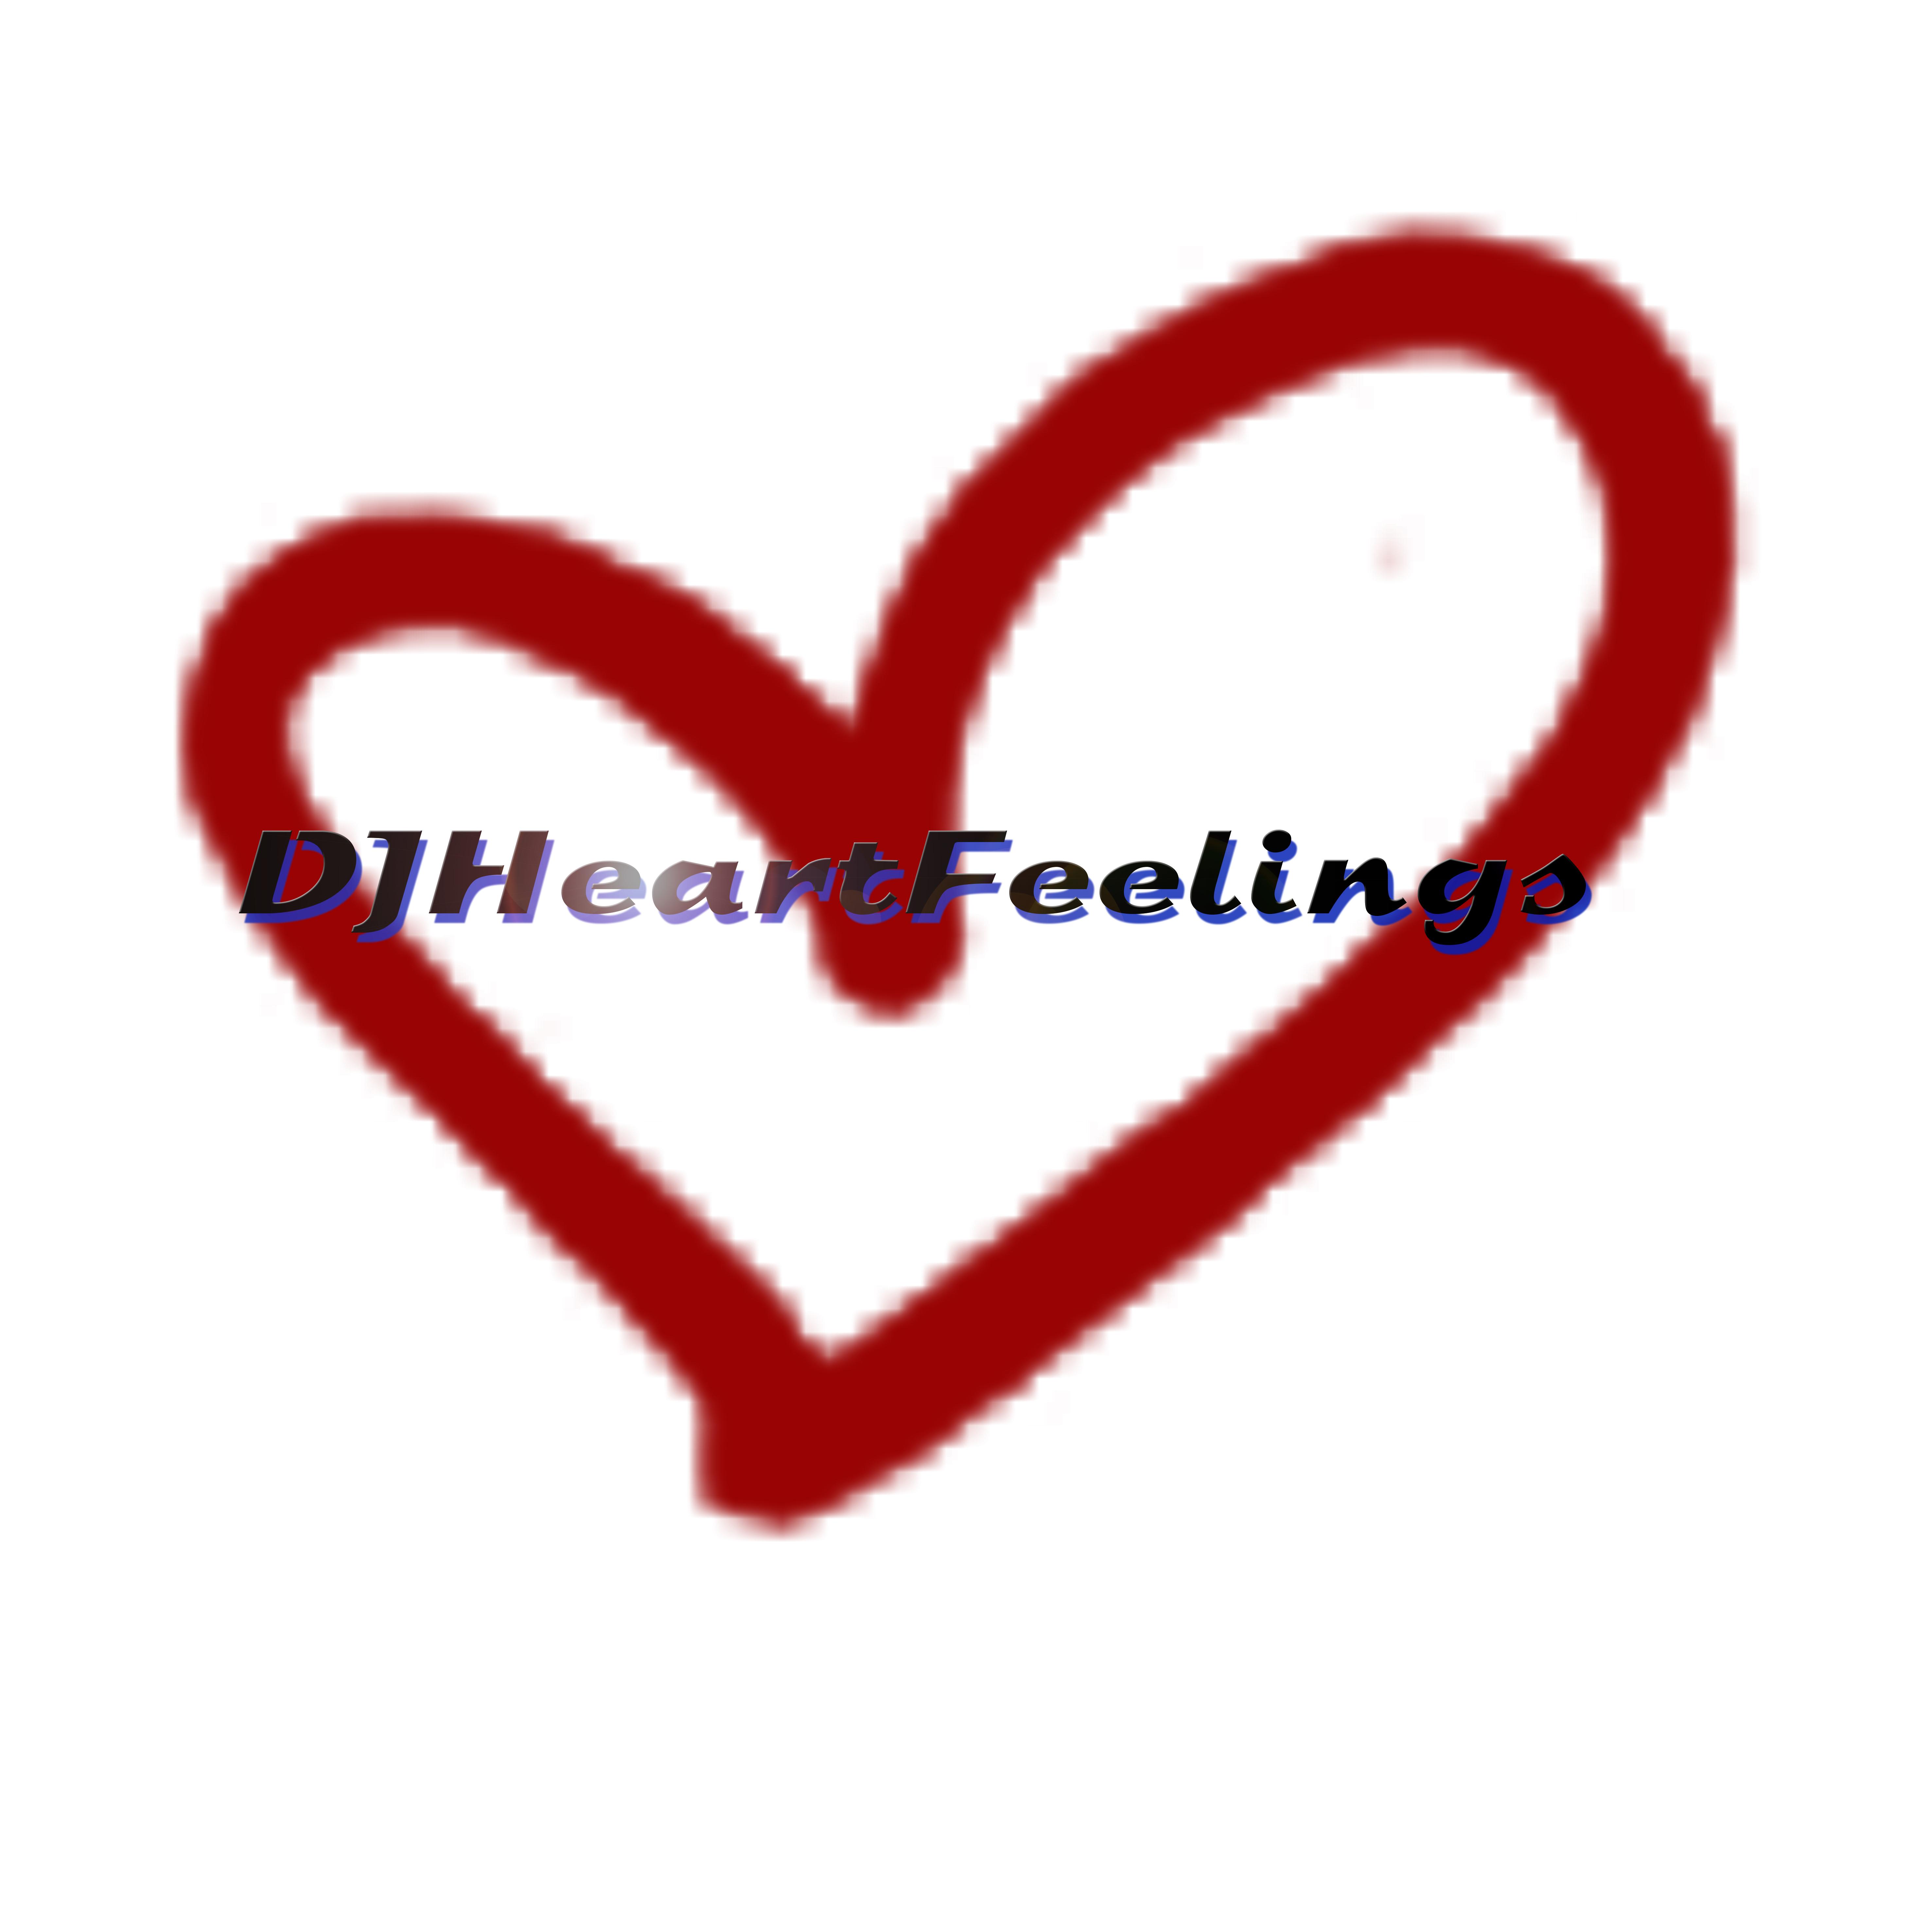 Logo djheartfeelings.jpg